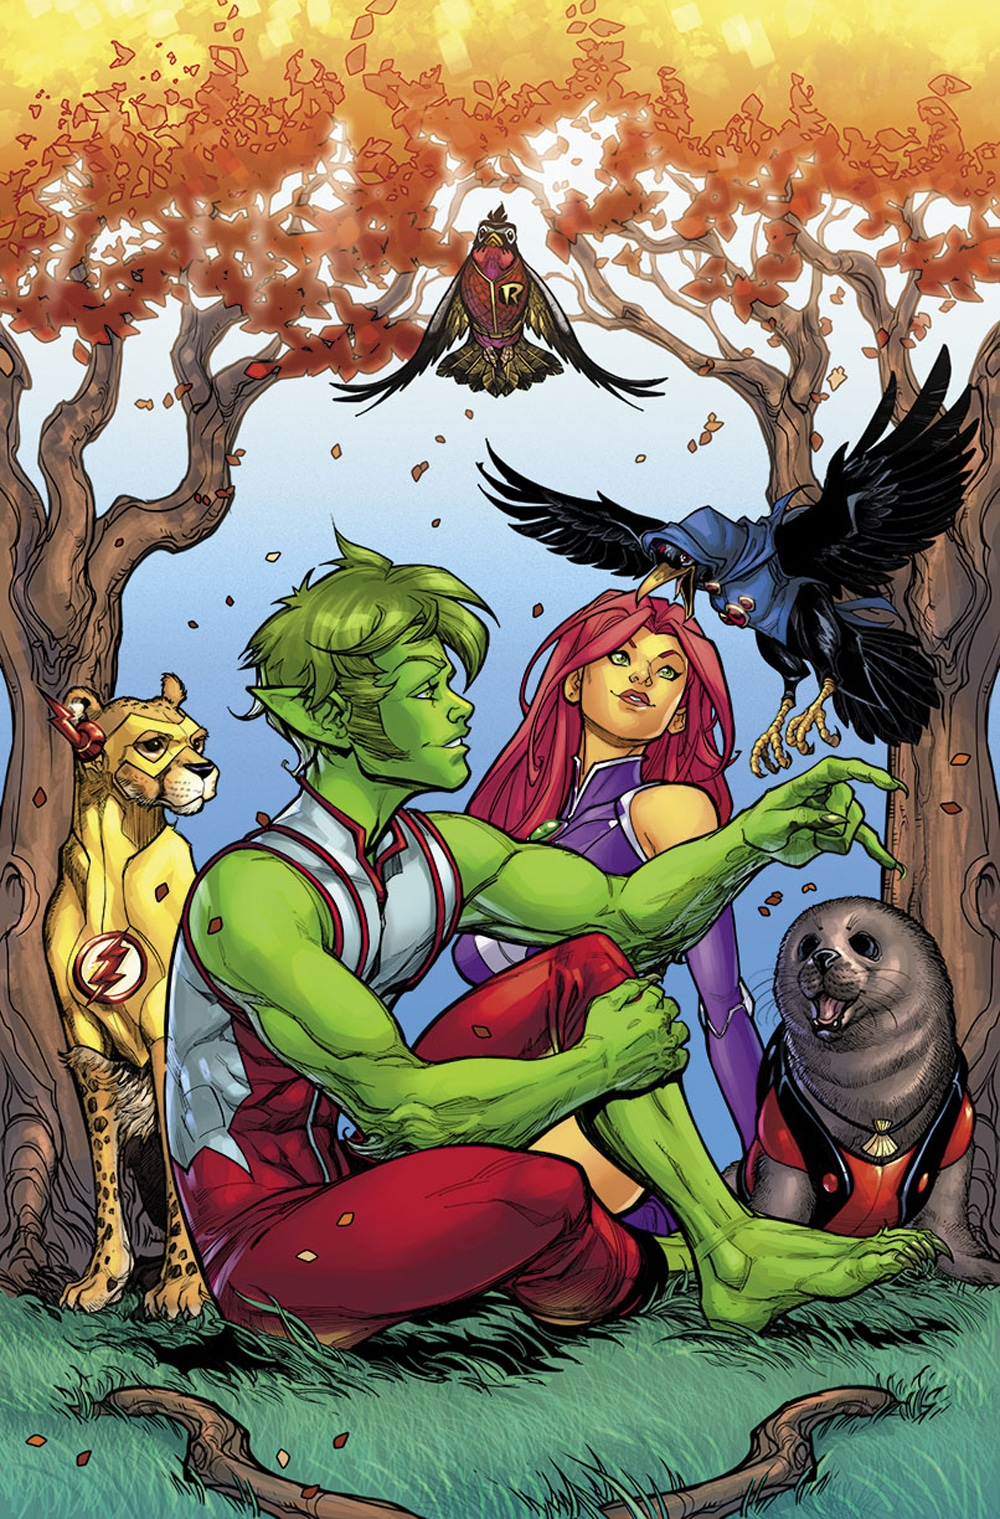 Teen Titans Vol 6 16 Textless Variant.jpg